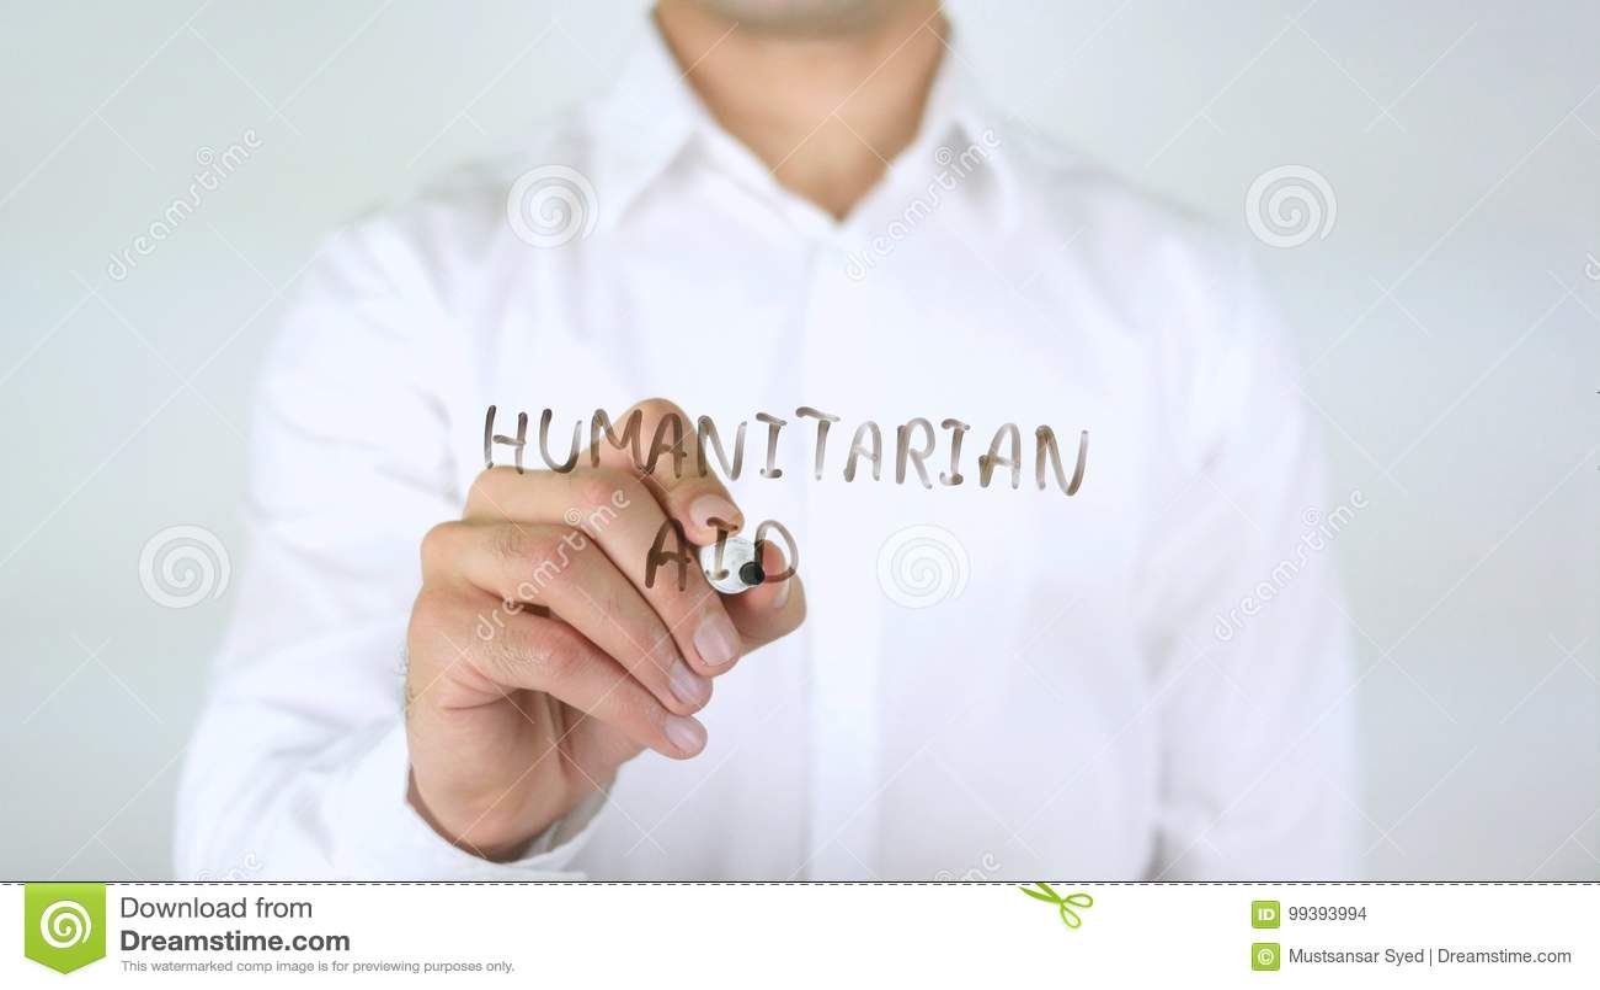 Aiuto umanitario, uomo d affari Writing su vetro